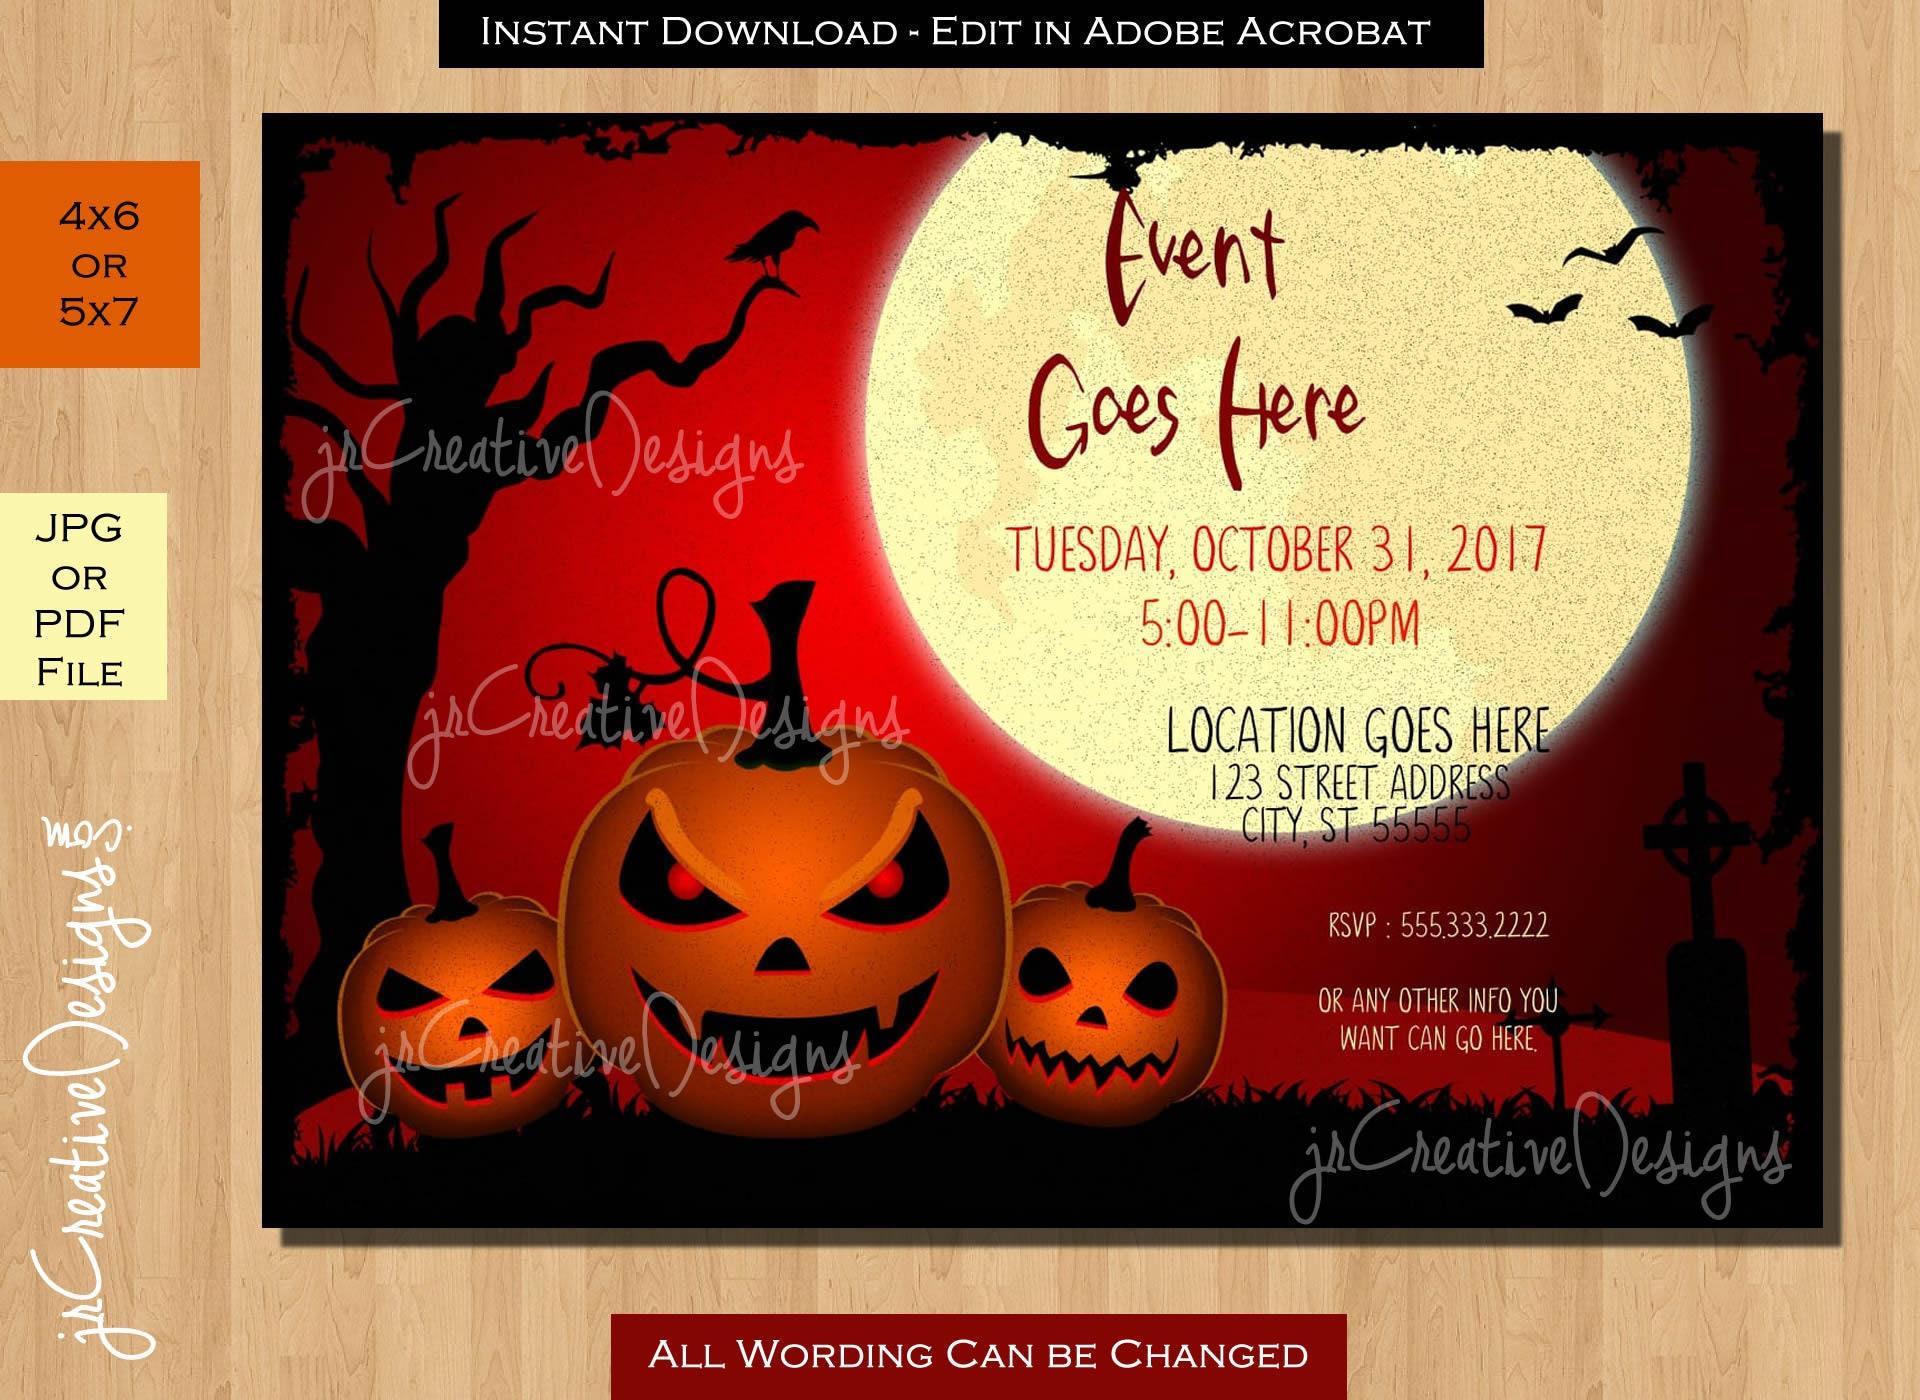 Halloween Invites Halloween Invitations Costume party Halloween ...